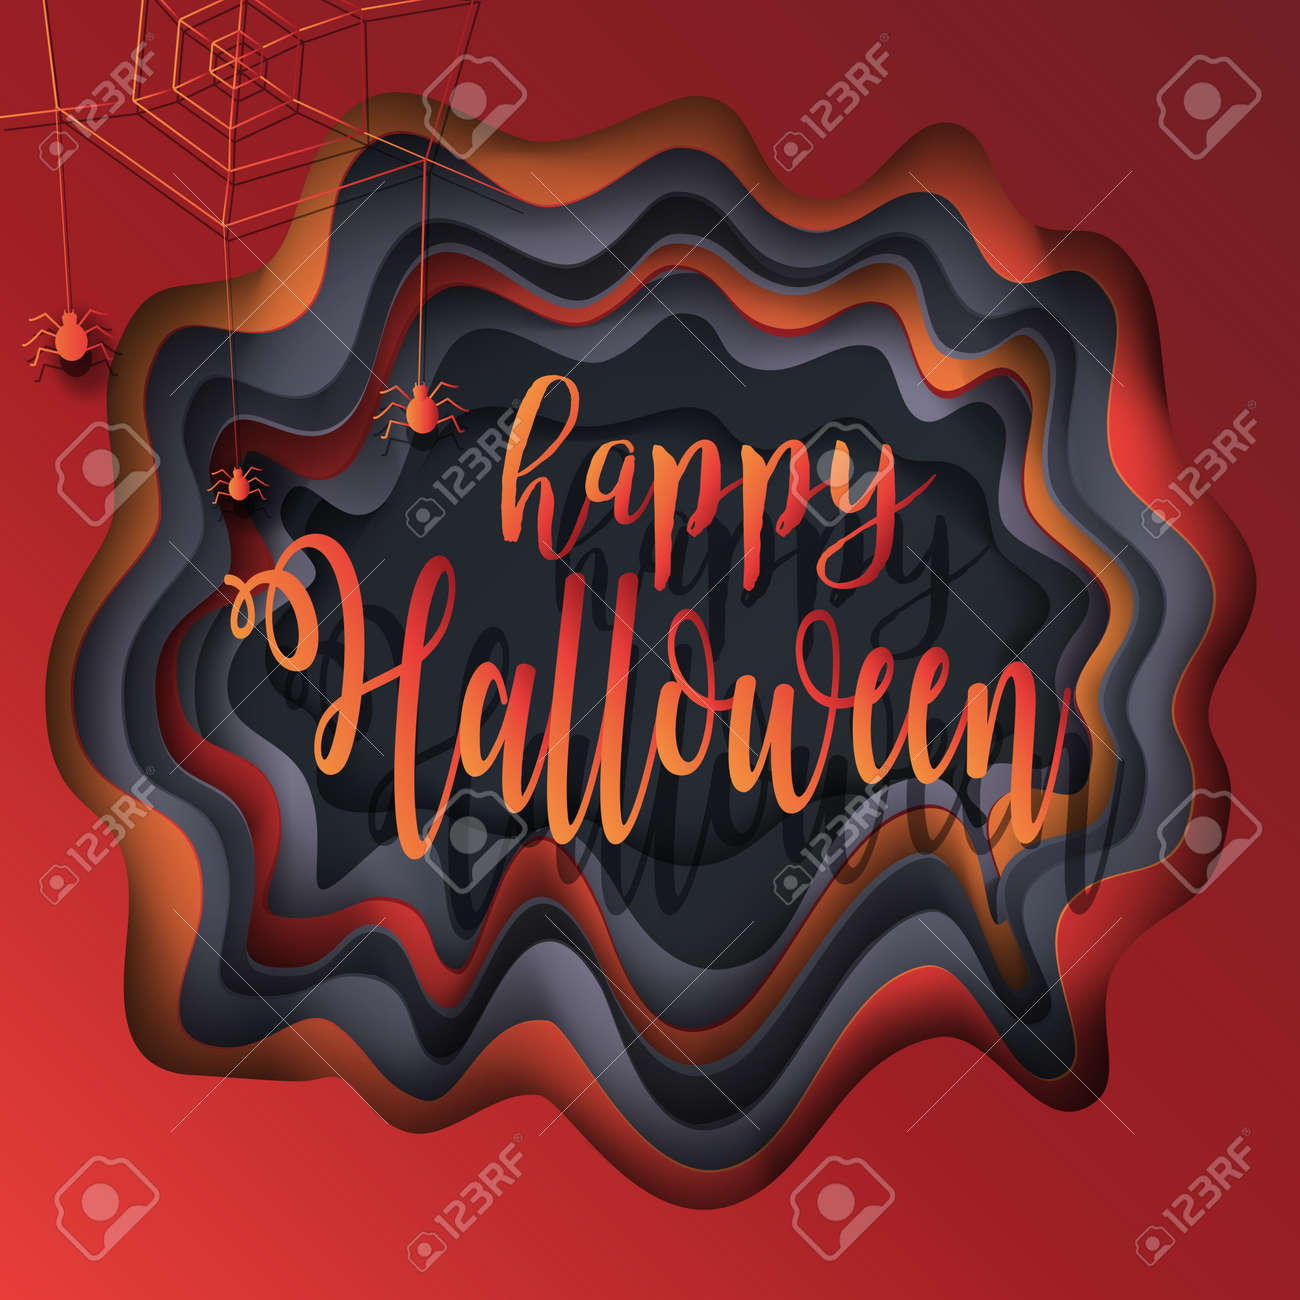 Free Art Abstract Halloween